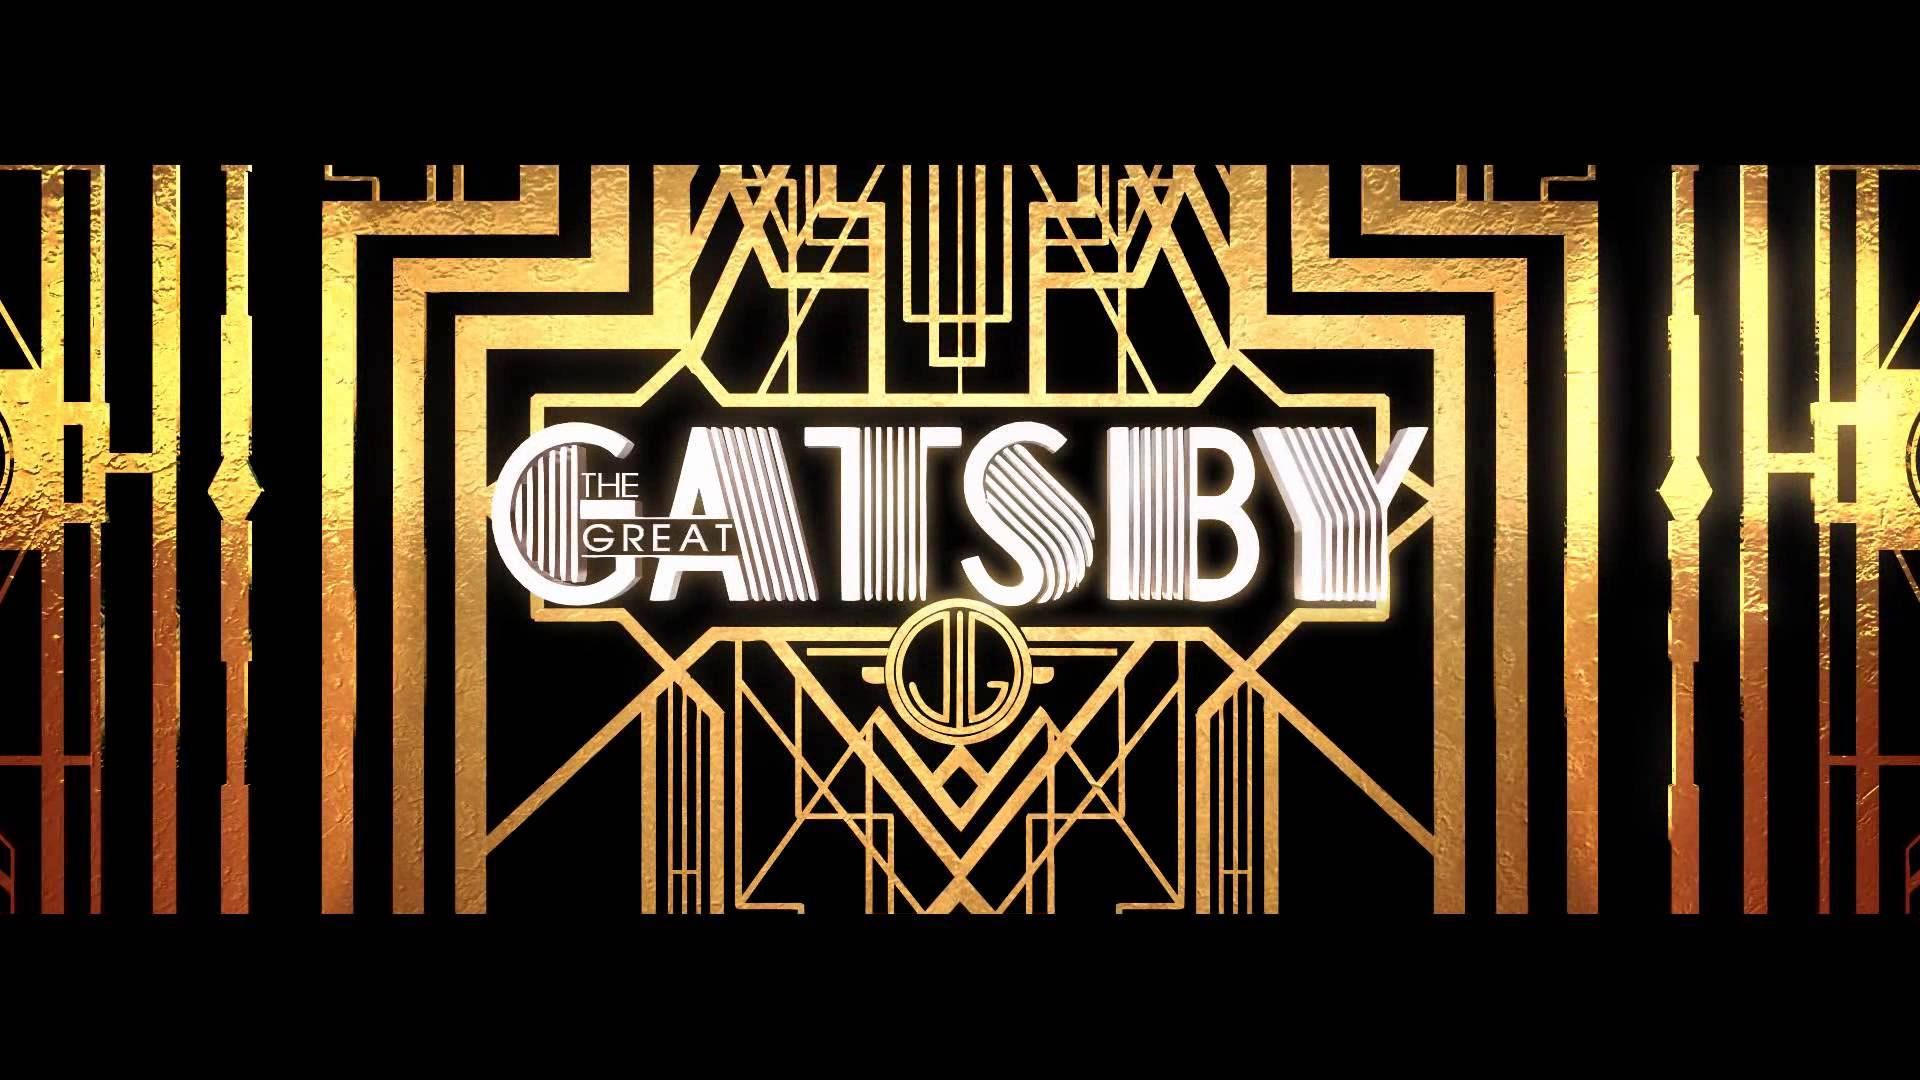 Great Gatsby good wallpaper hd